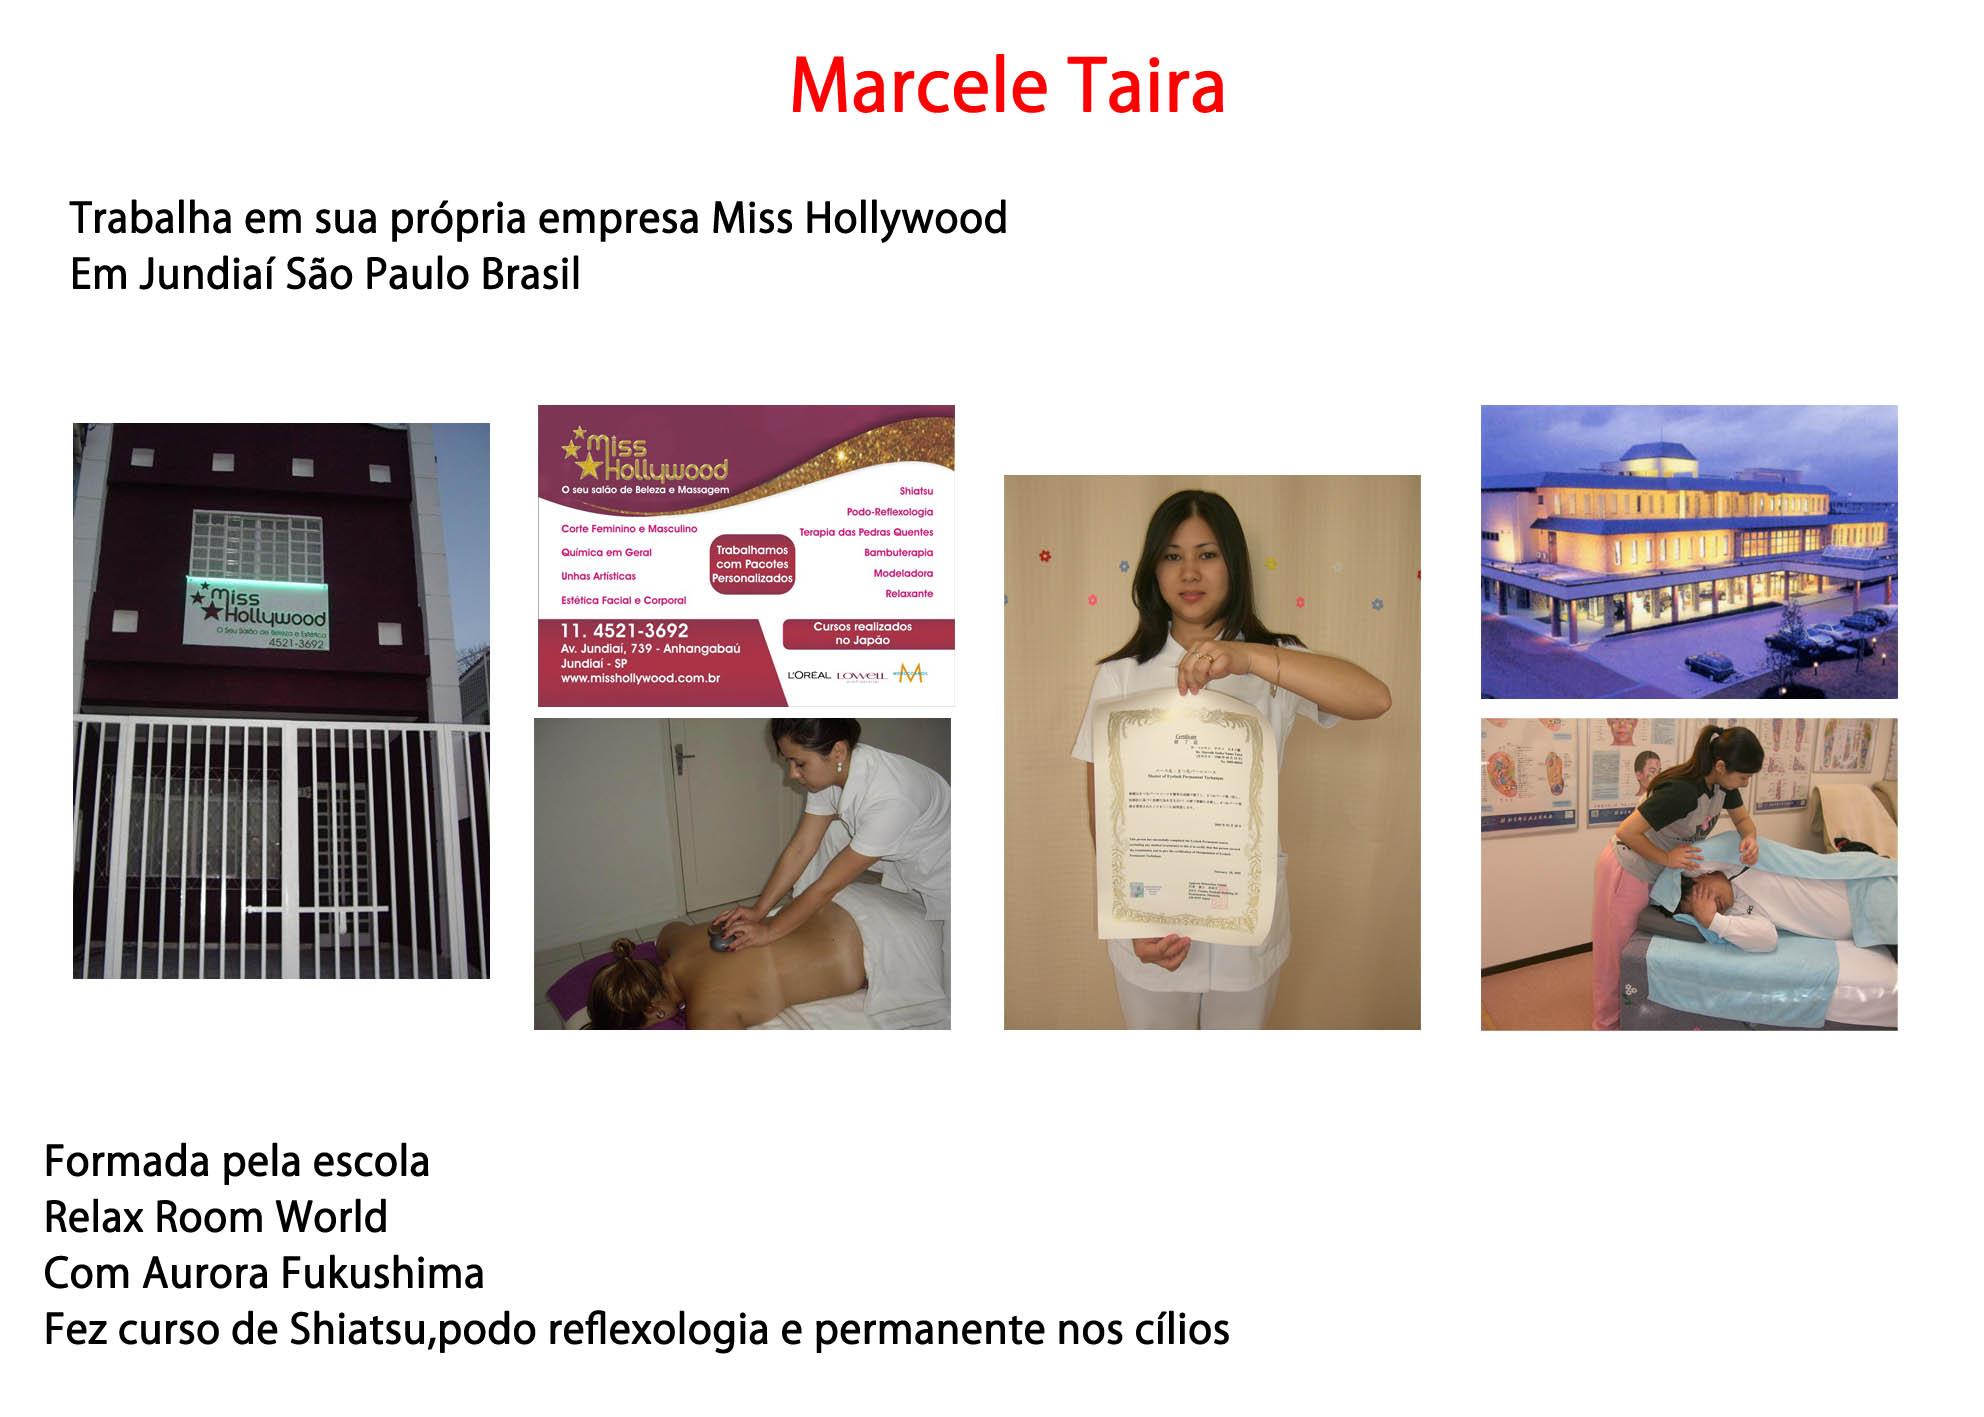 Marcele Taira